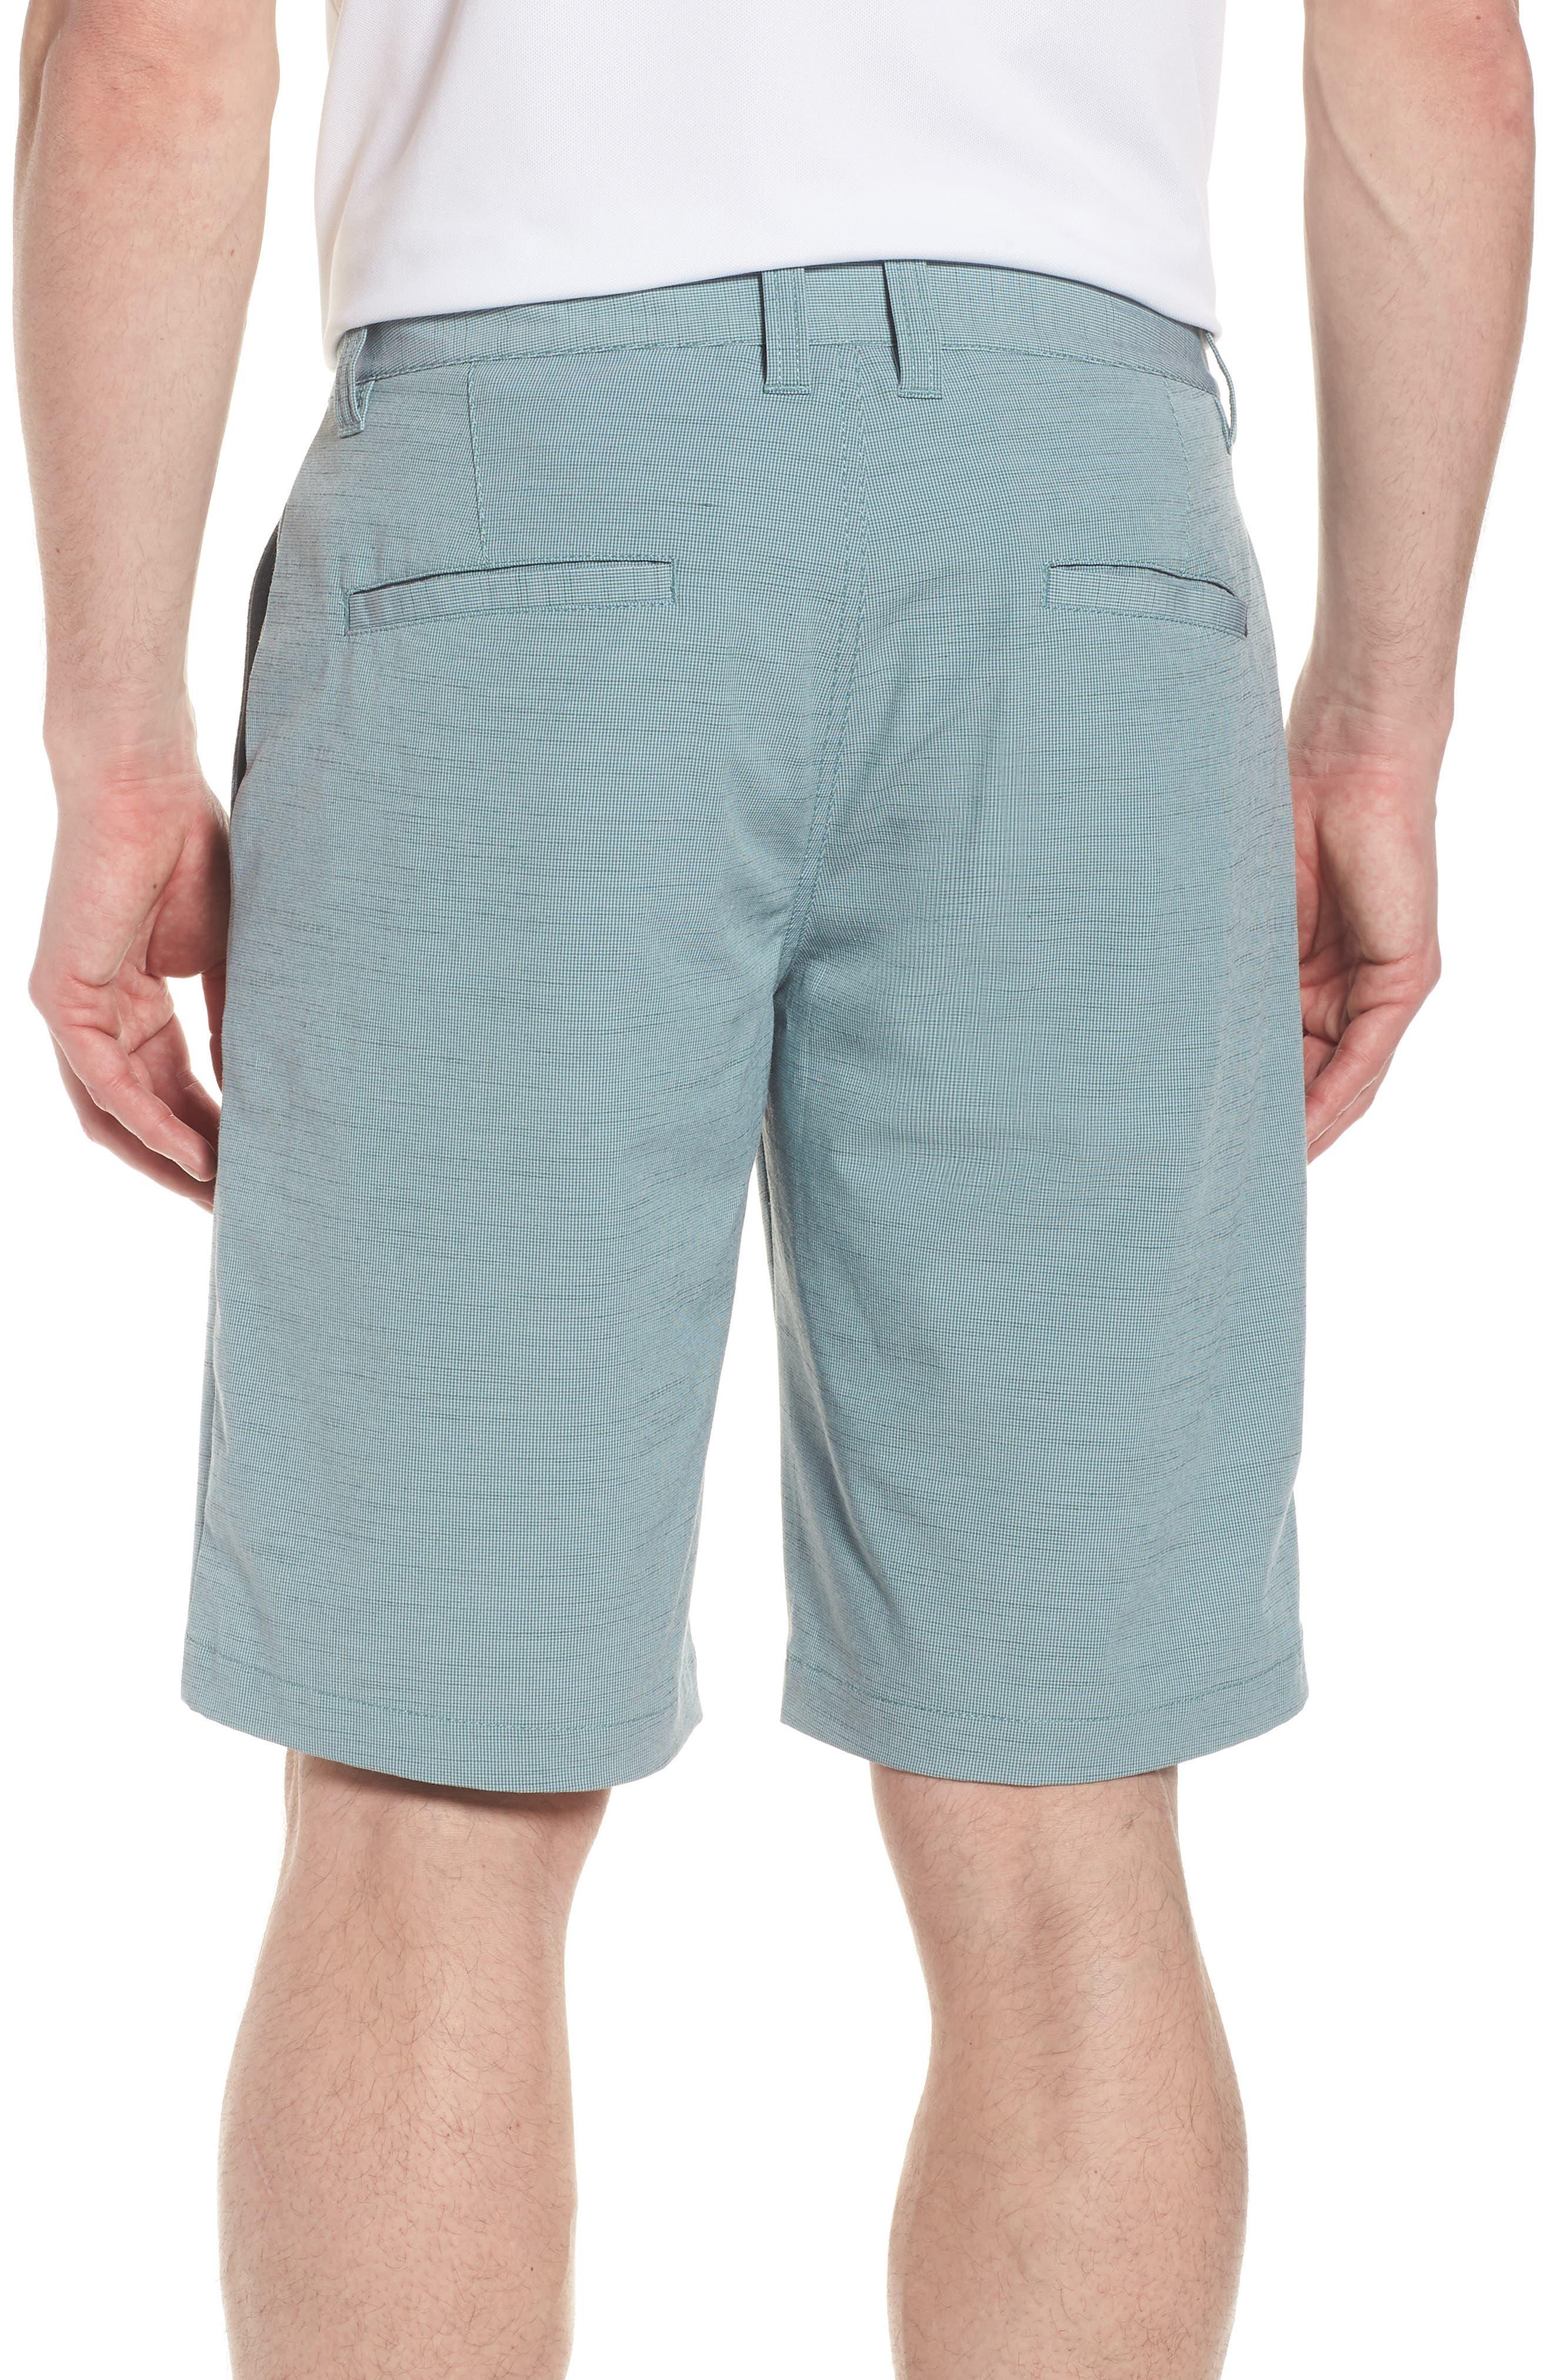 Tulum Stretch Shorts,                             Alternate thumbnail 2, color,                             300